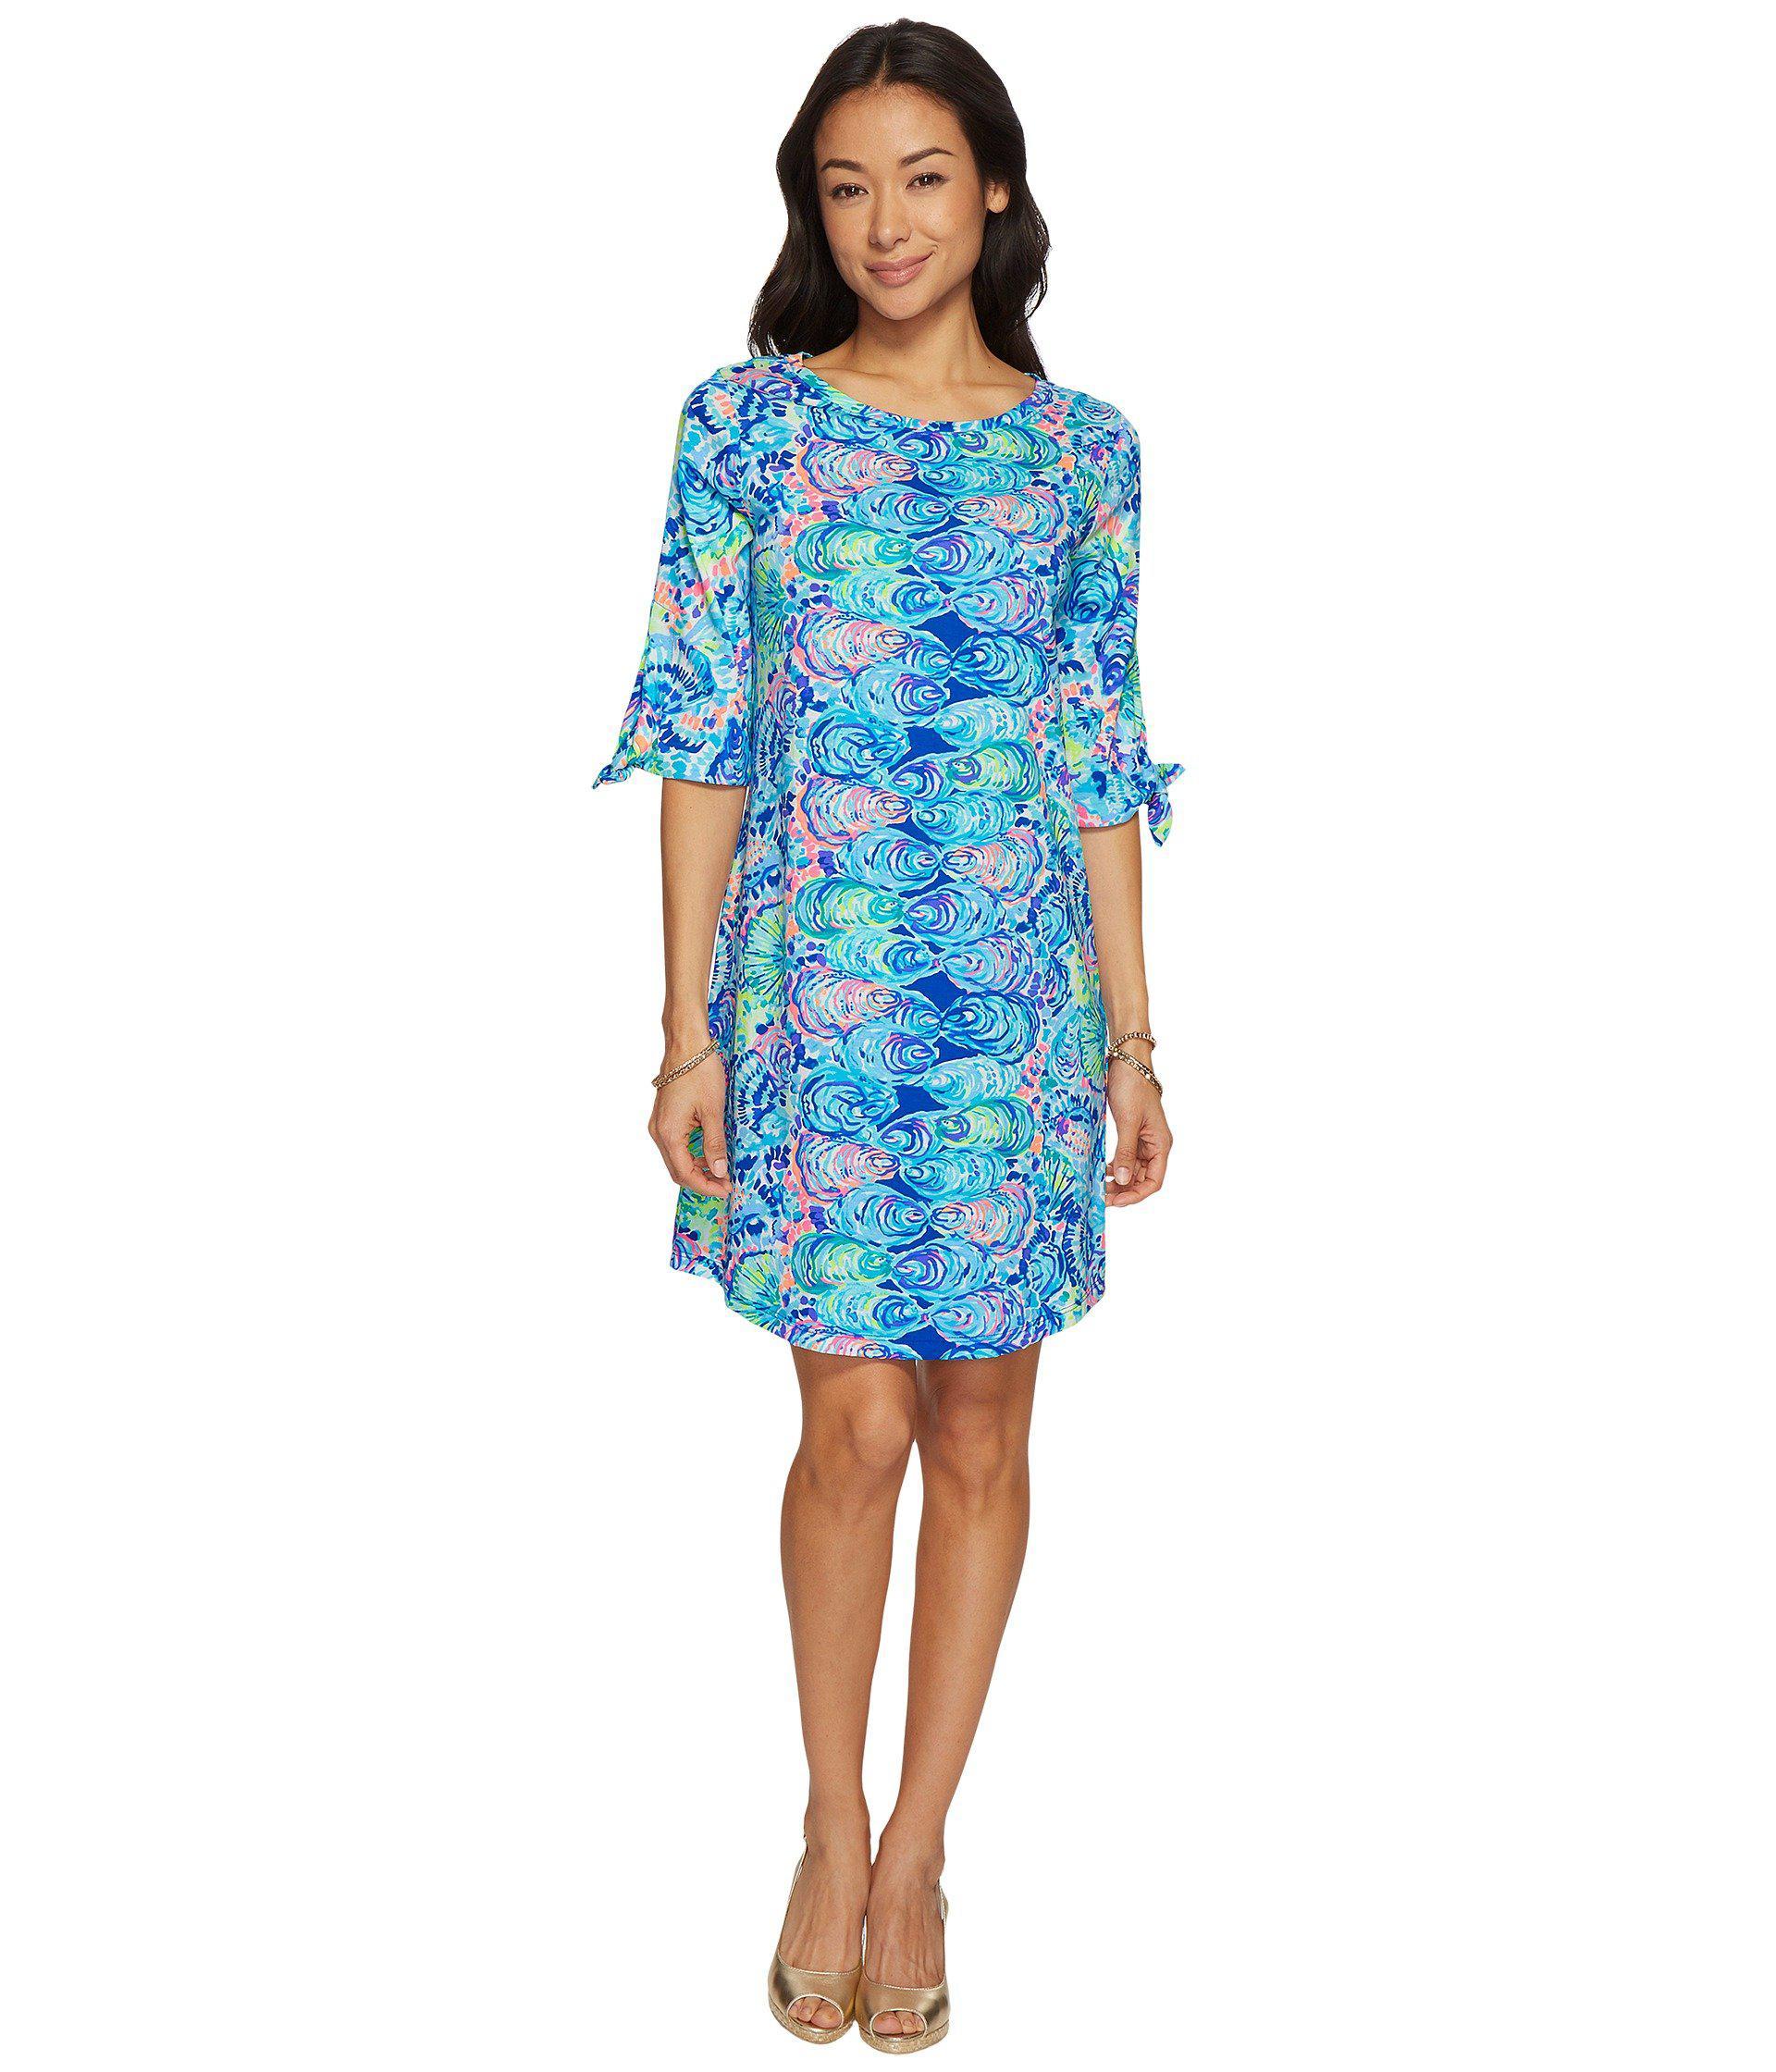 Lyst - Lilly Pulitzer Preston Dress in Blue